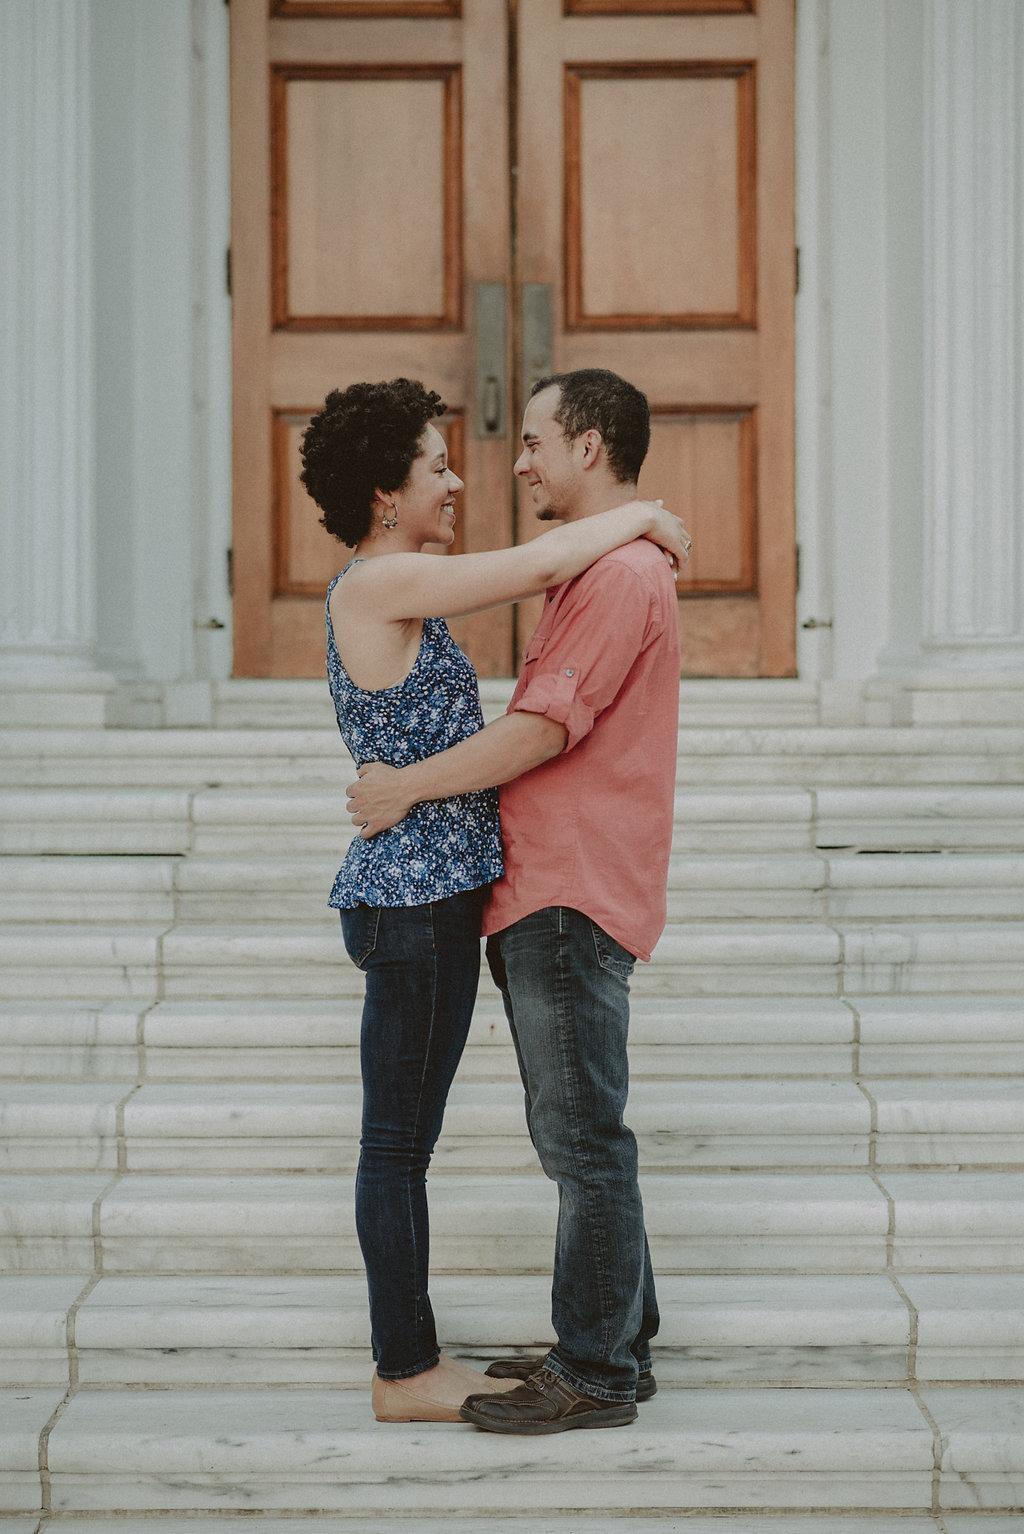 Couple hugging on steps